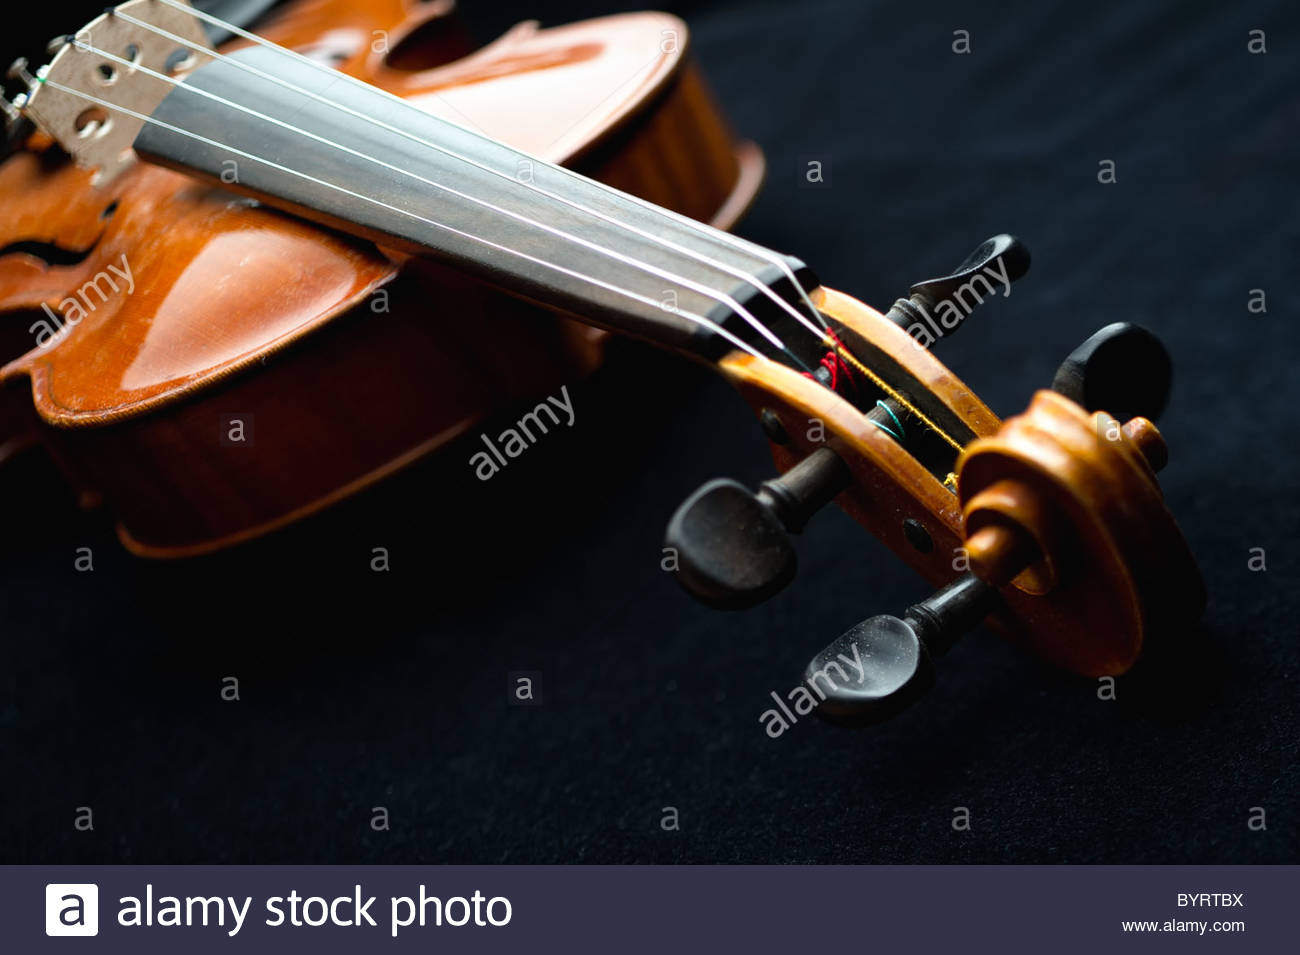 close-up of a Stradivarius style violin - Stock Image